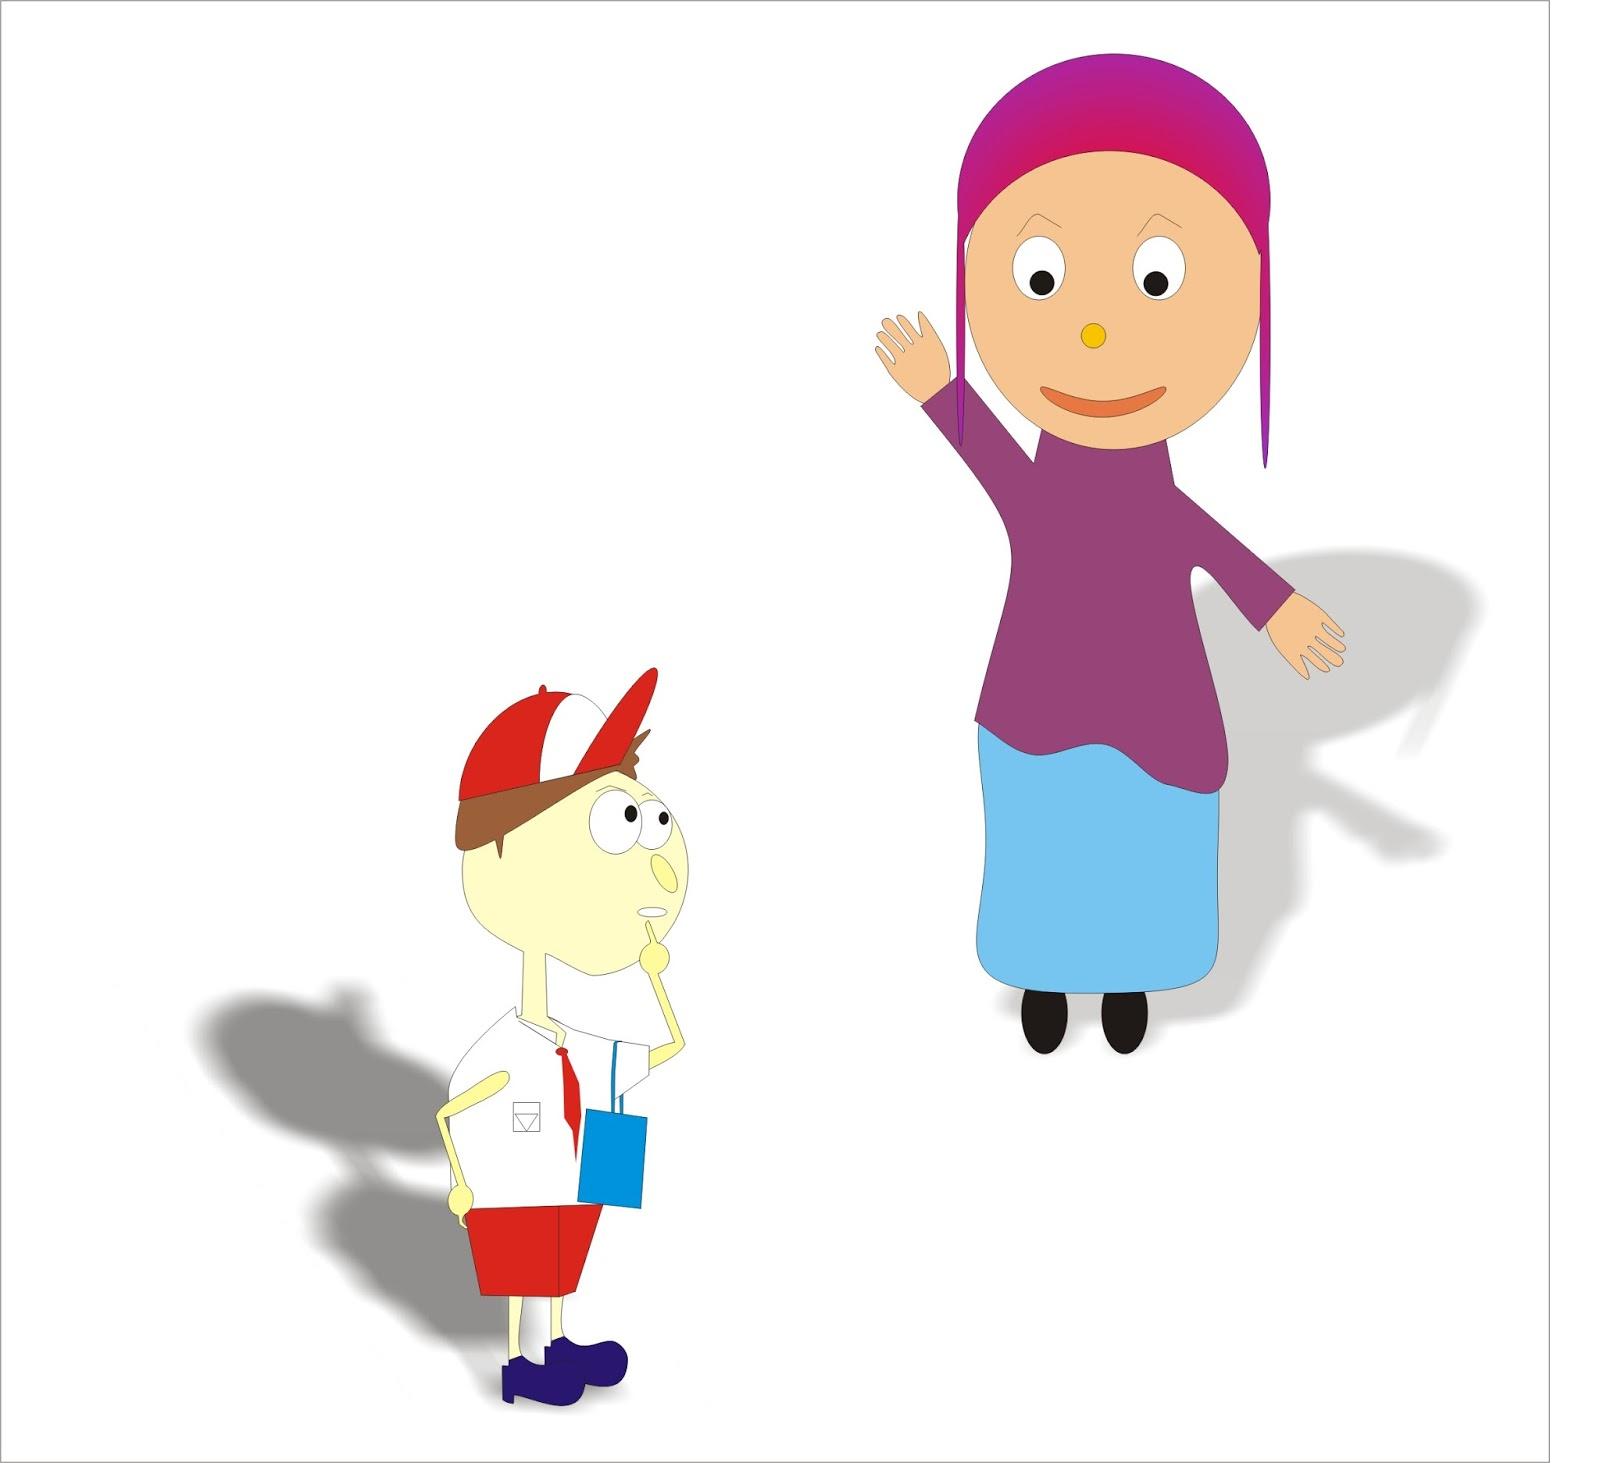 99 Animasi Bergerak Gambar Guru Mengajar Kartun Cikimm Com